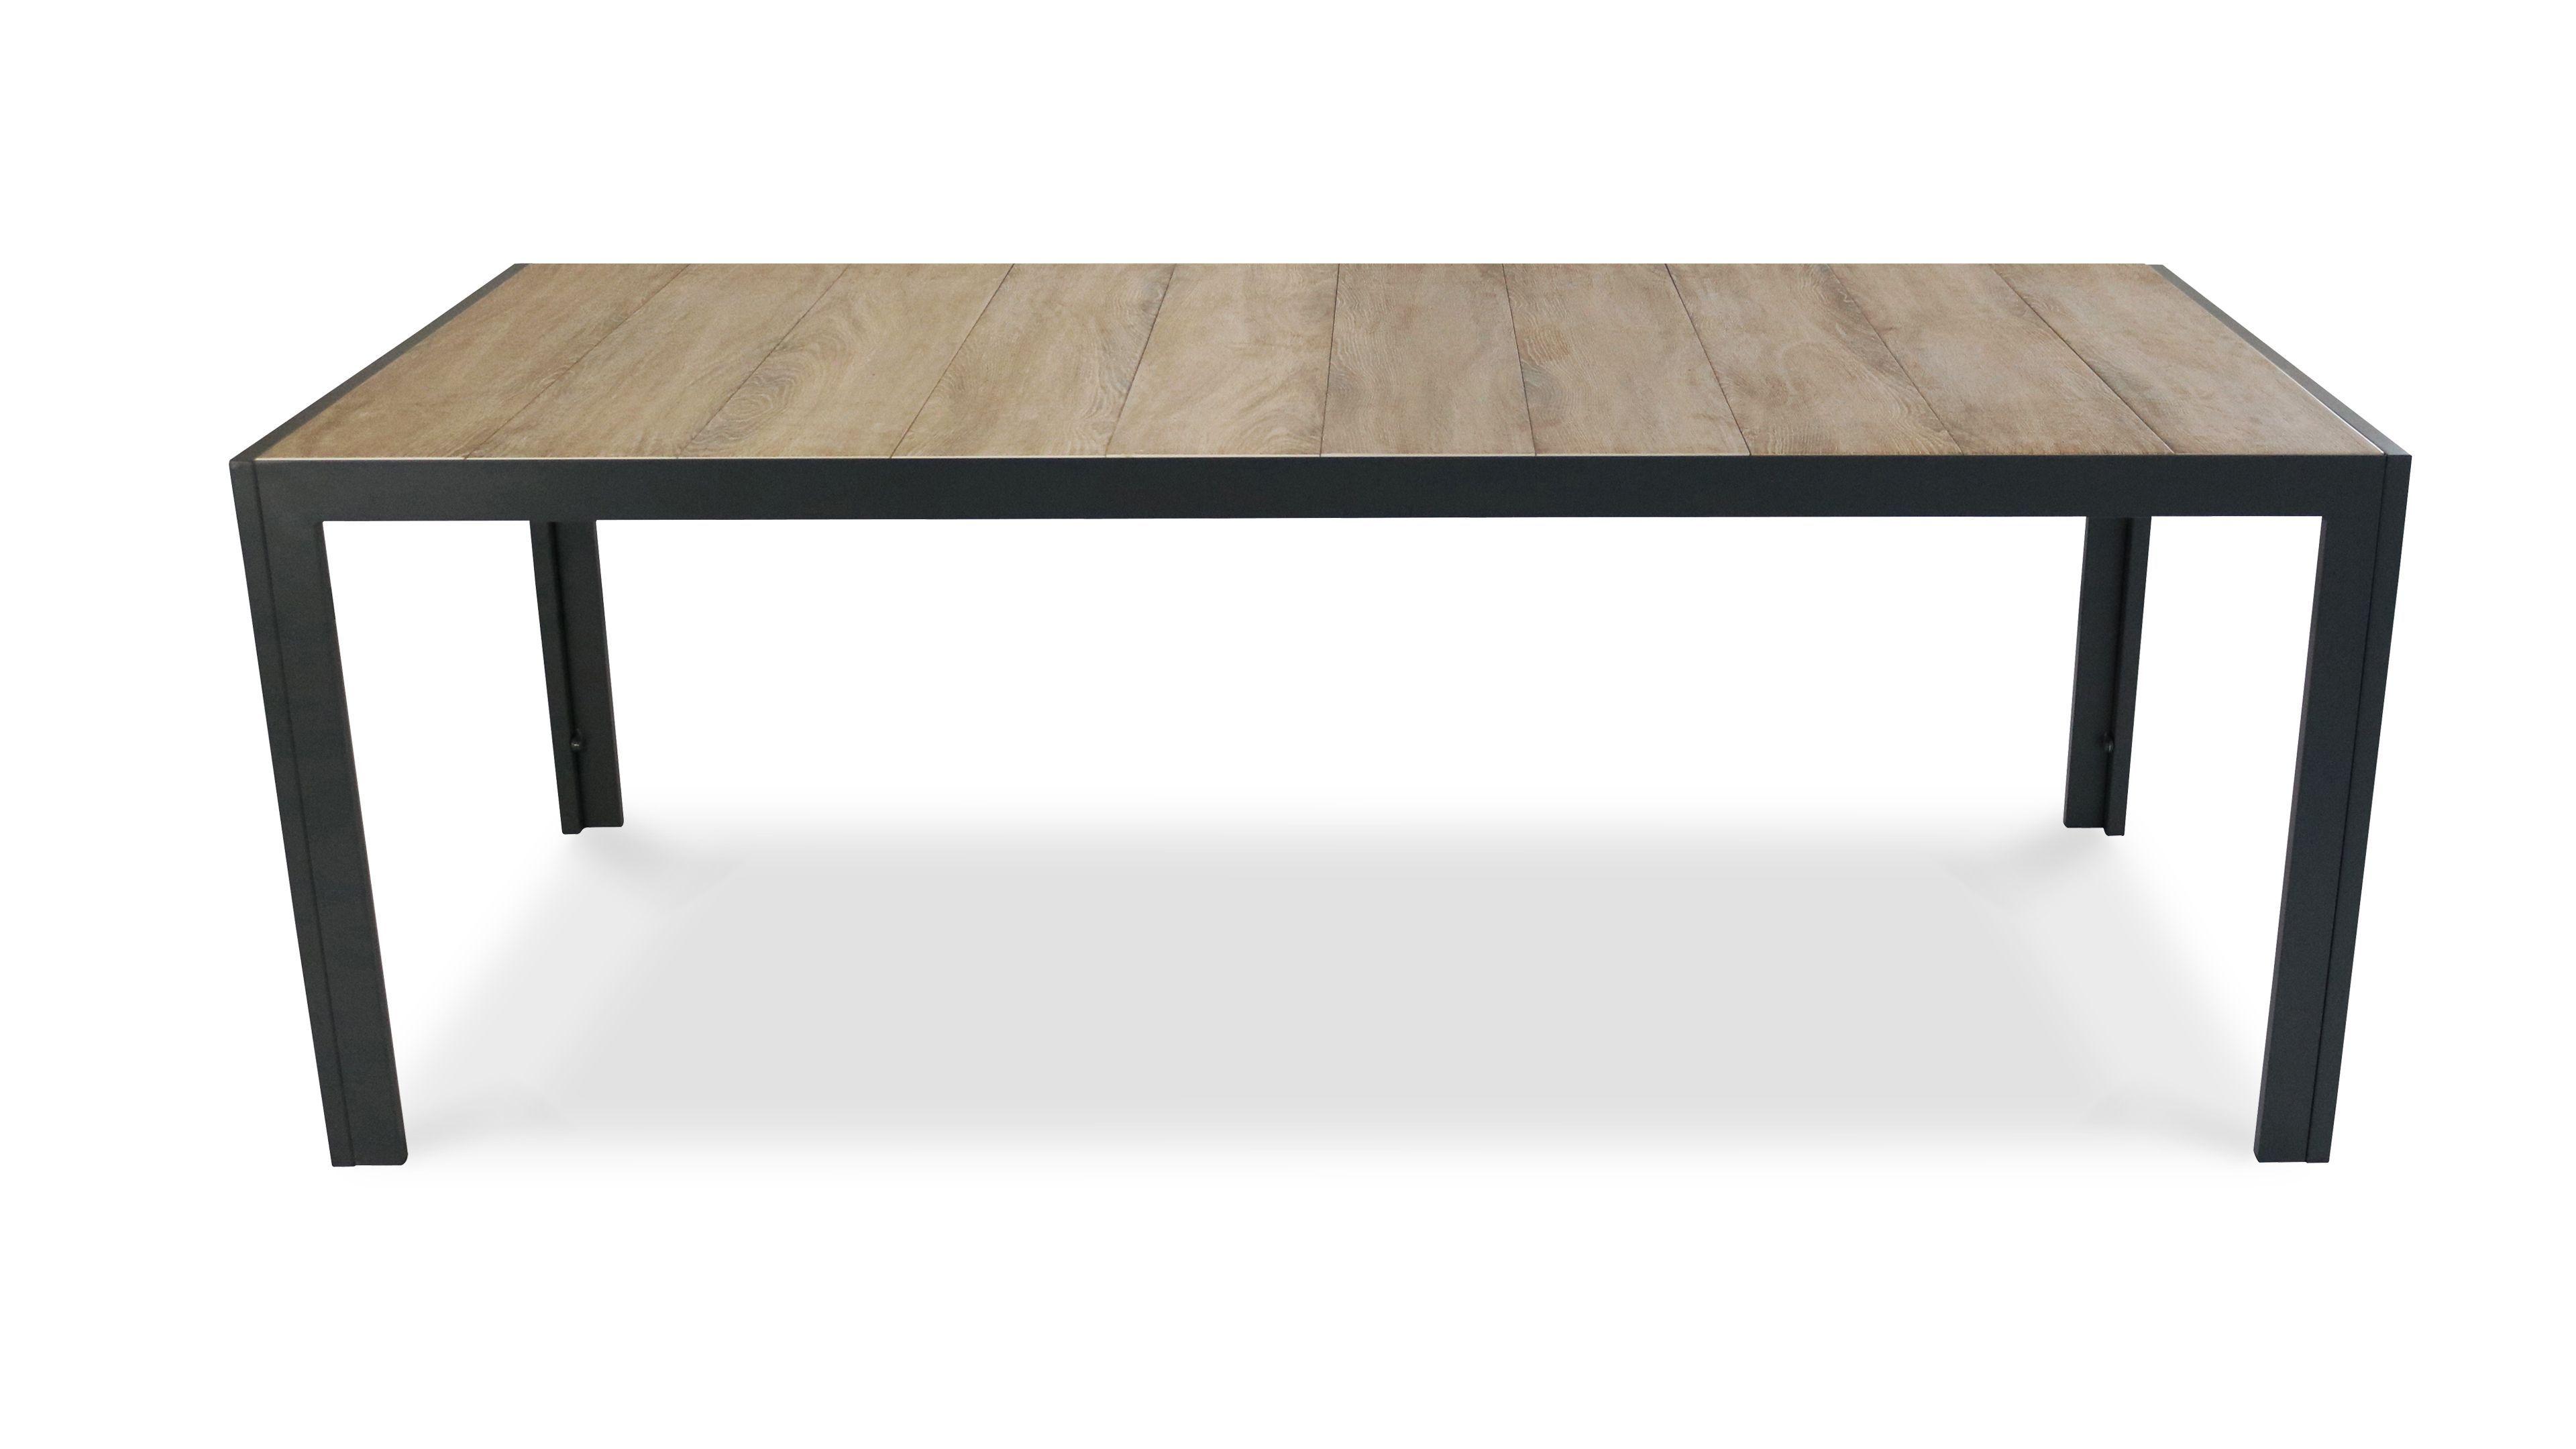 Table De Jardin Aluminium Et Ceramique Table De Jardin Mobilier